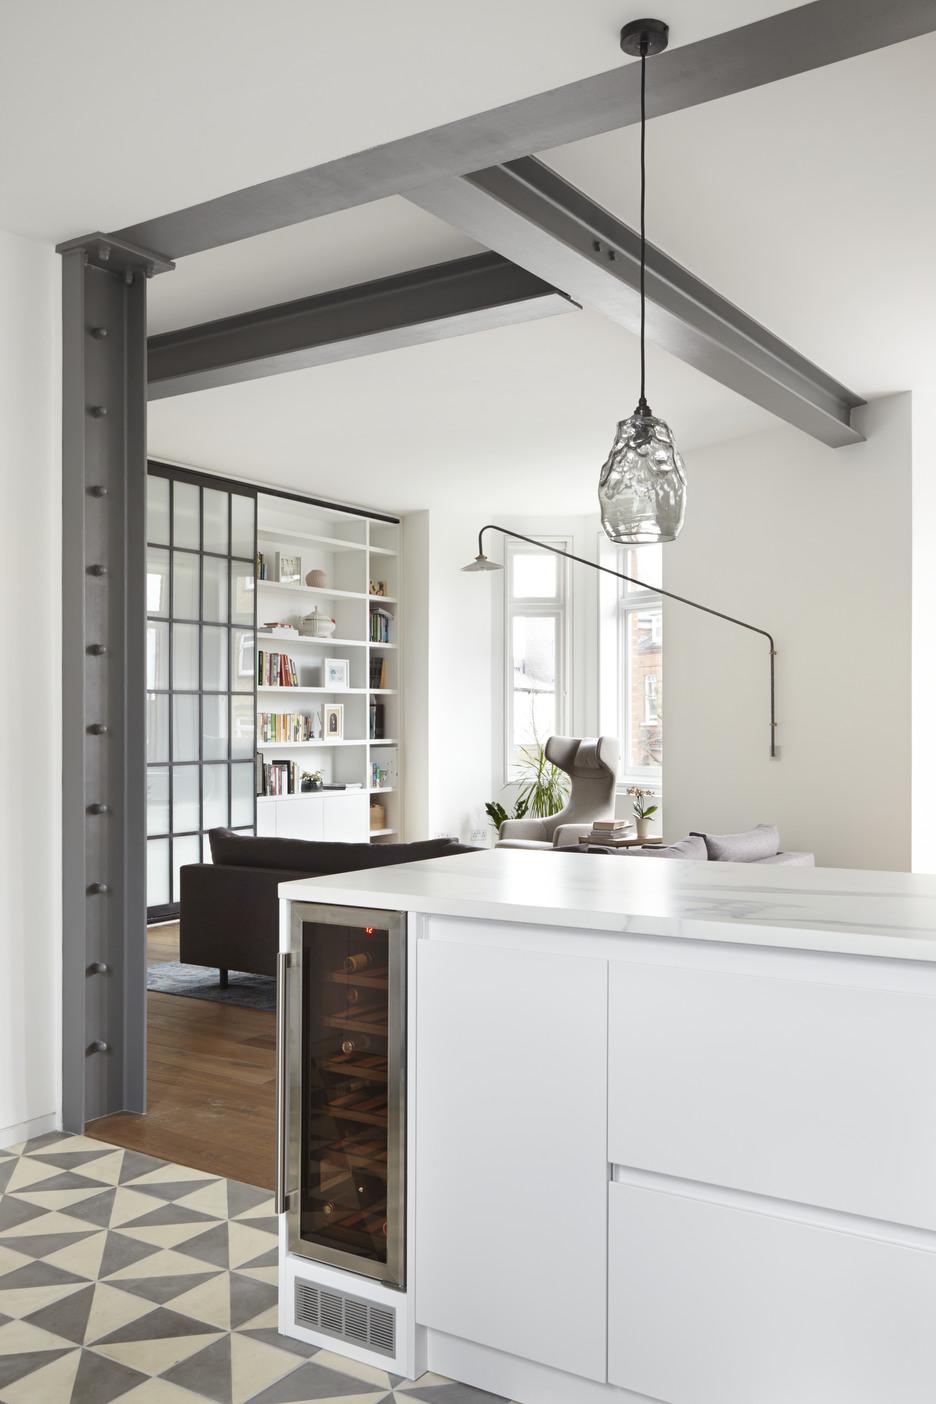 1sean-ronnie-hill-glenshaw-mansions-rise-design-studio